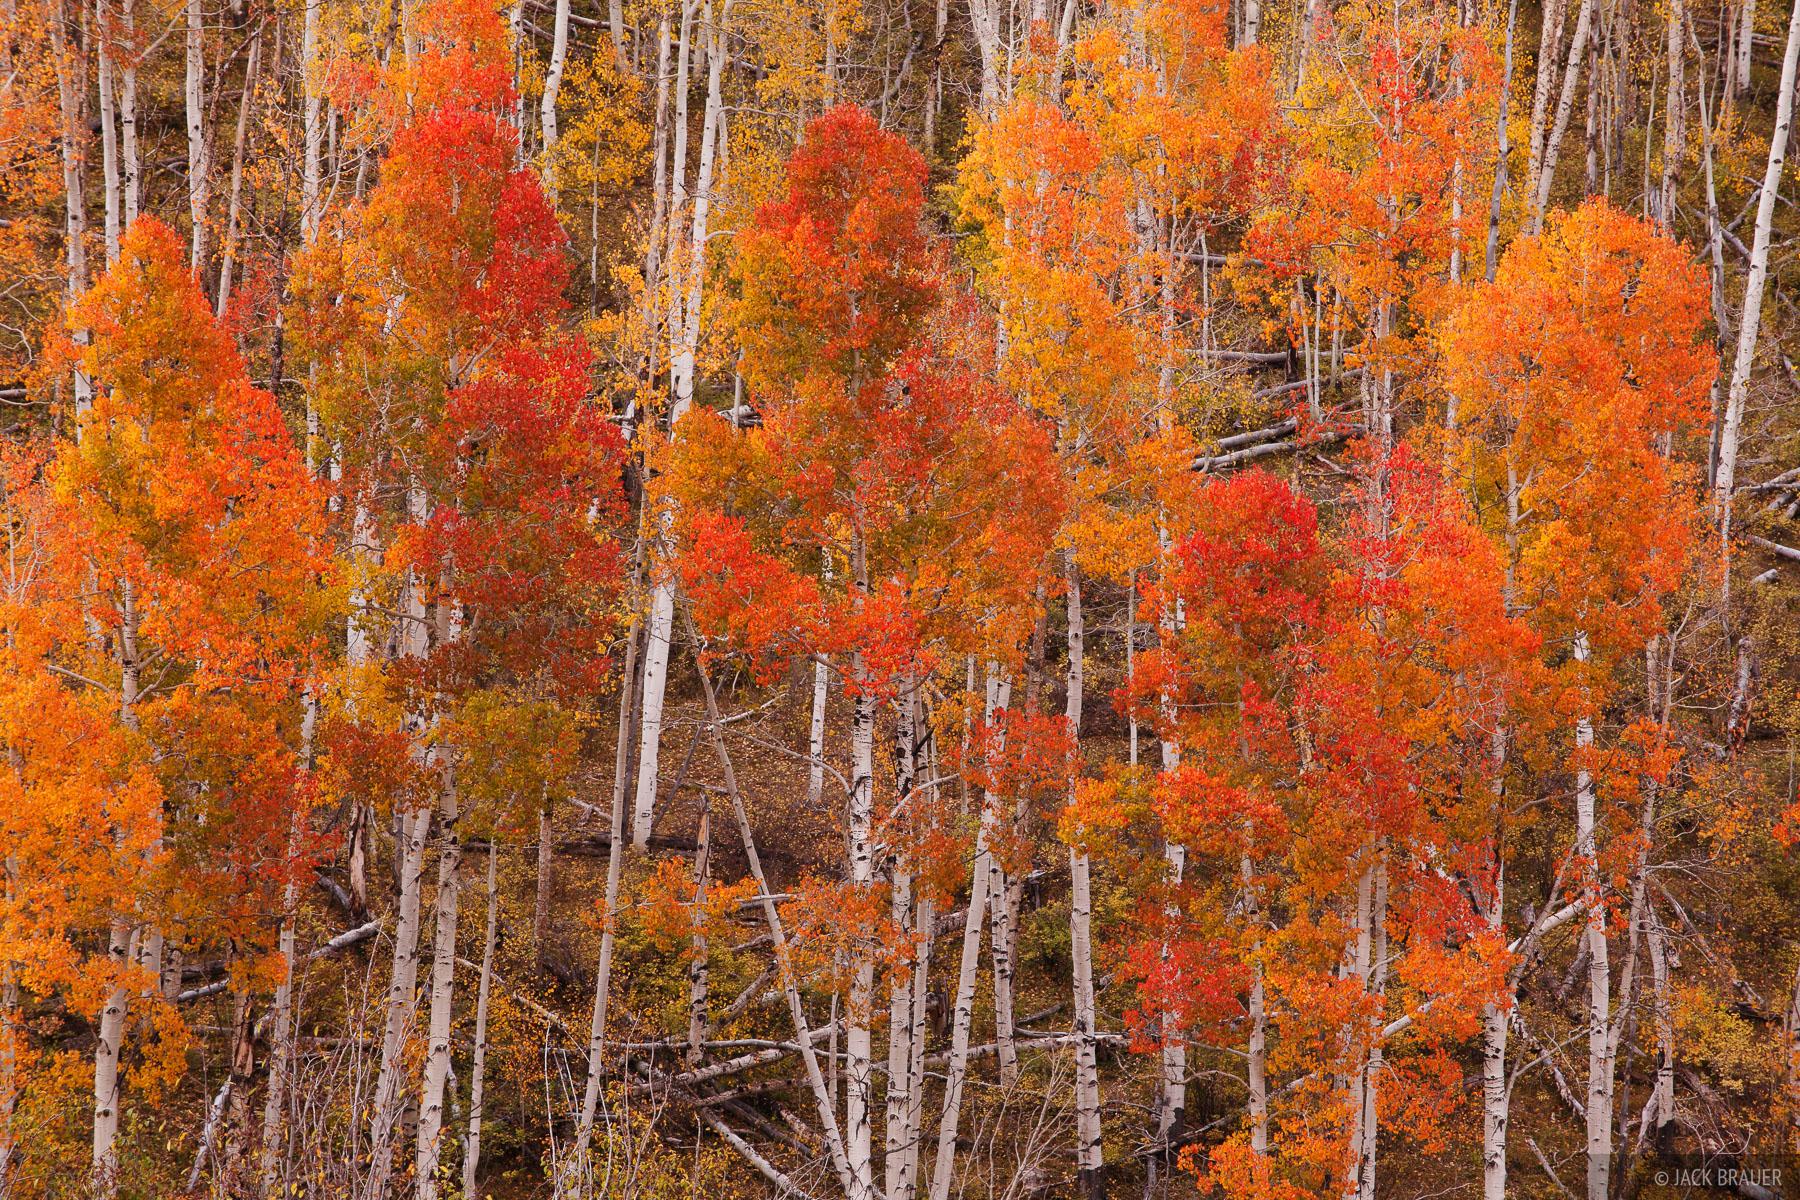 Dallas Divide, Sneffels Range, San Juan Mountains, Colorado, autumn, aspens, photo